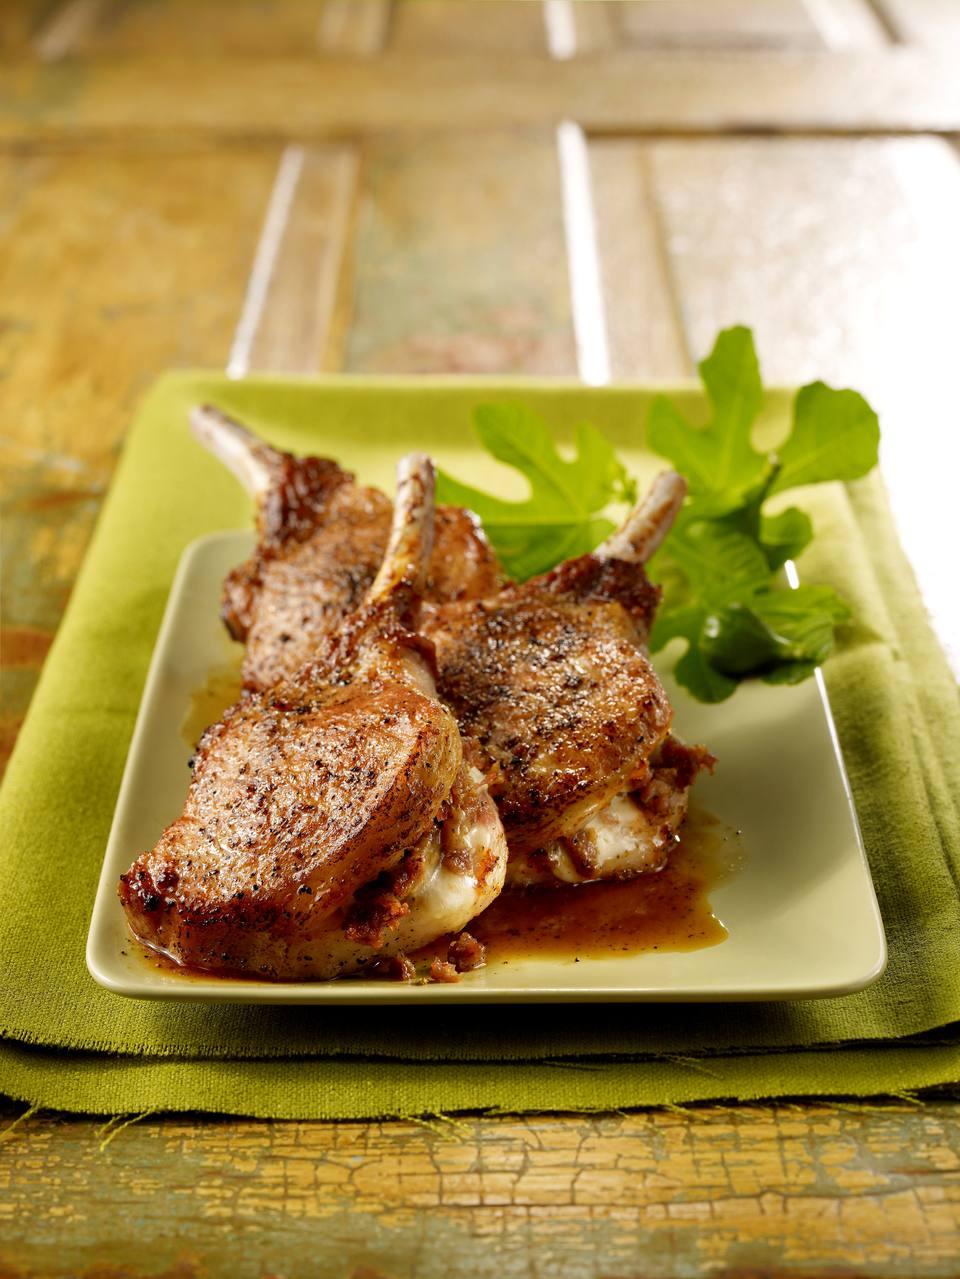 Garlic and Pancetta Stuffed Pork Chops